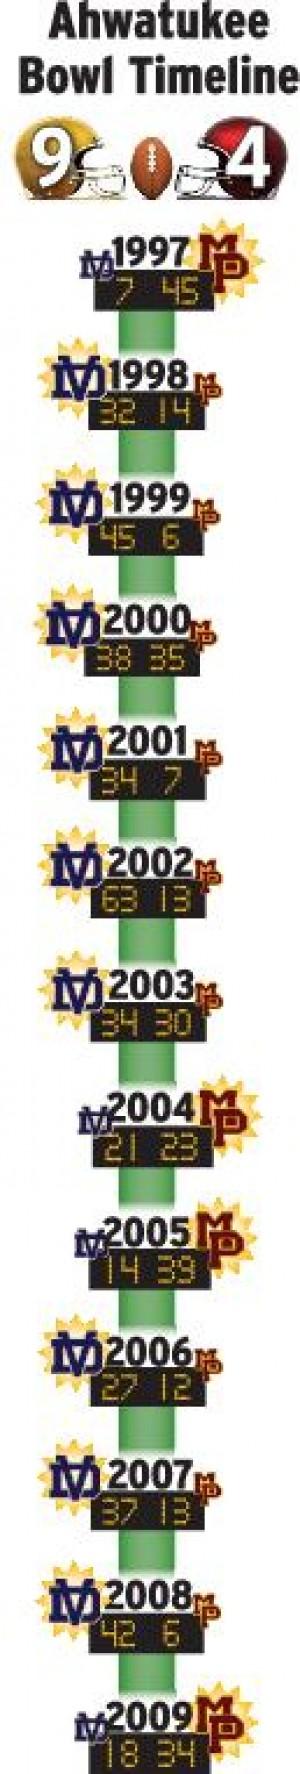 Ahwatukee Bowl Timeline FREE printable PDF